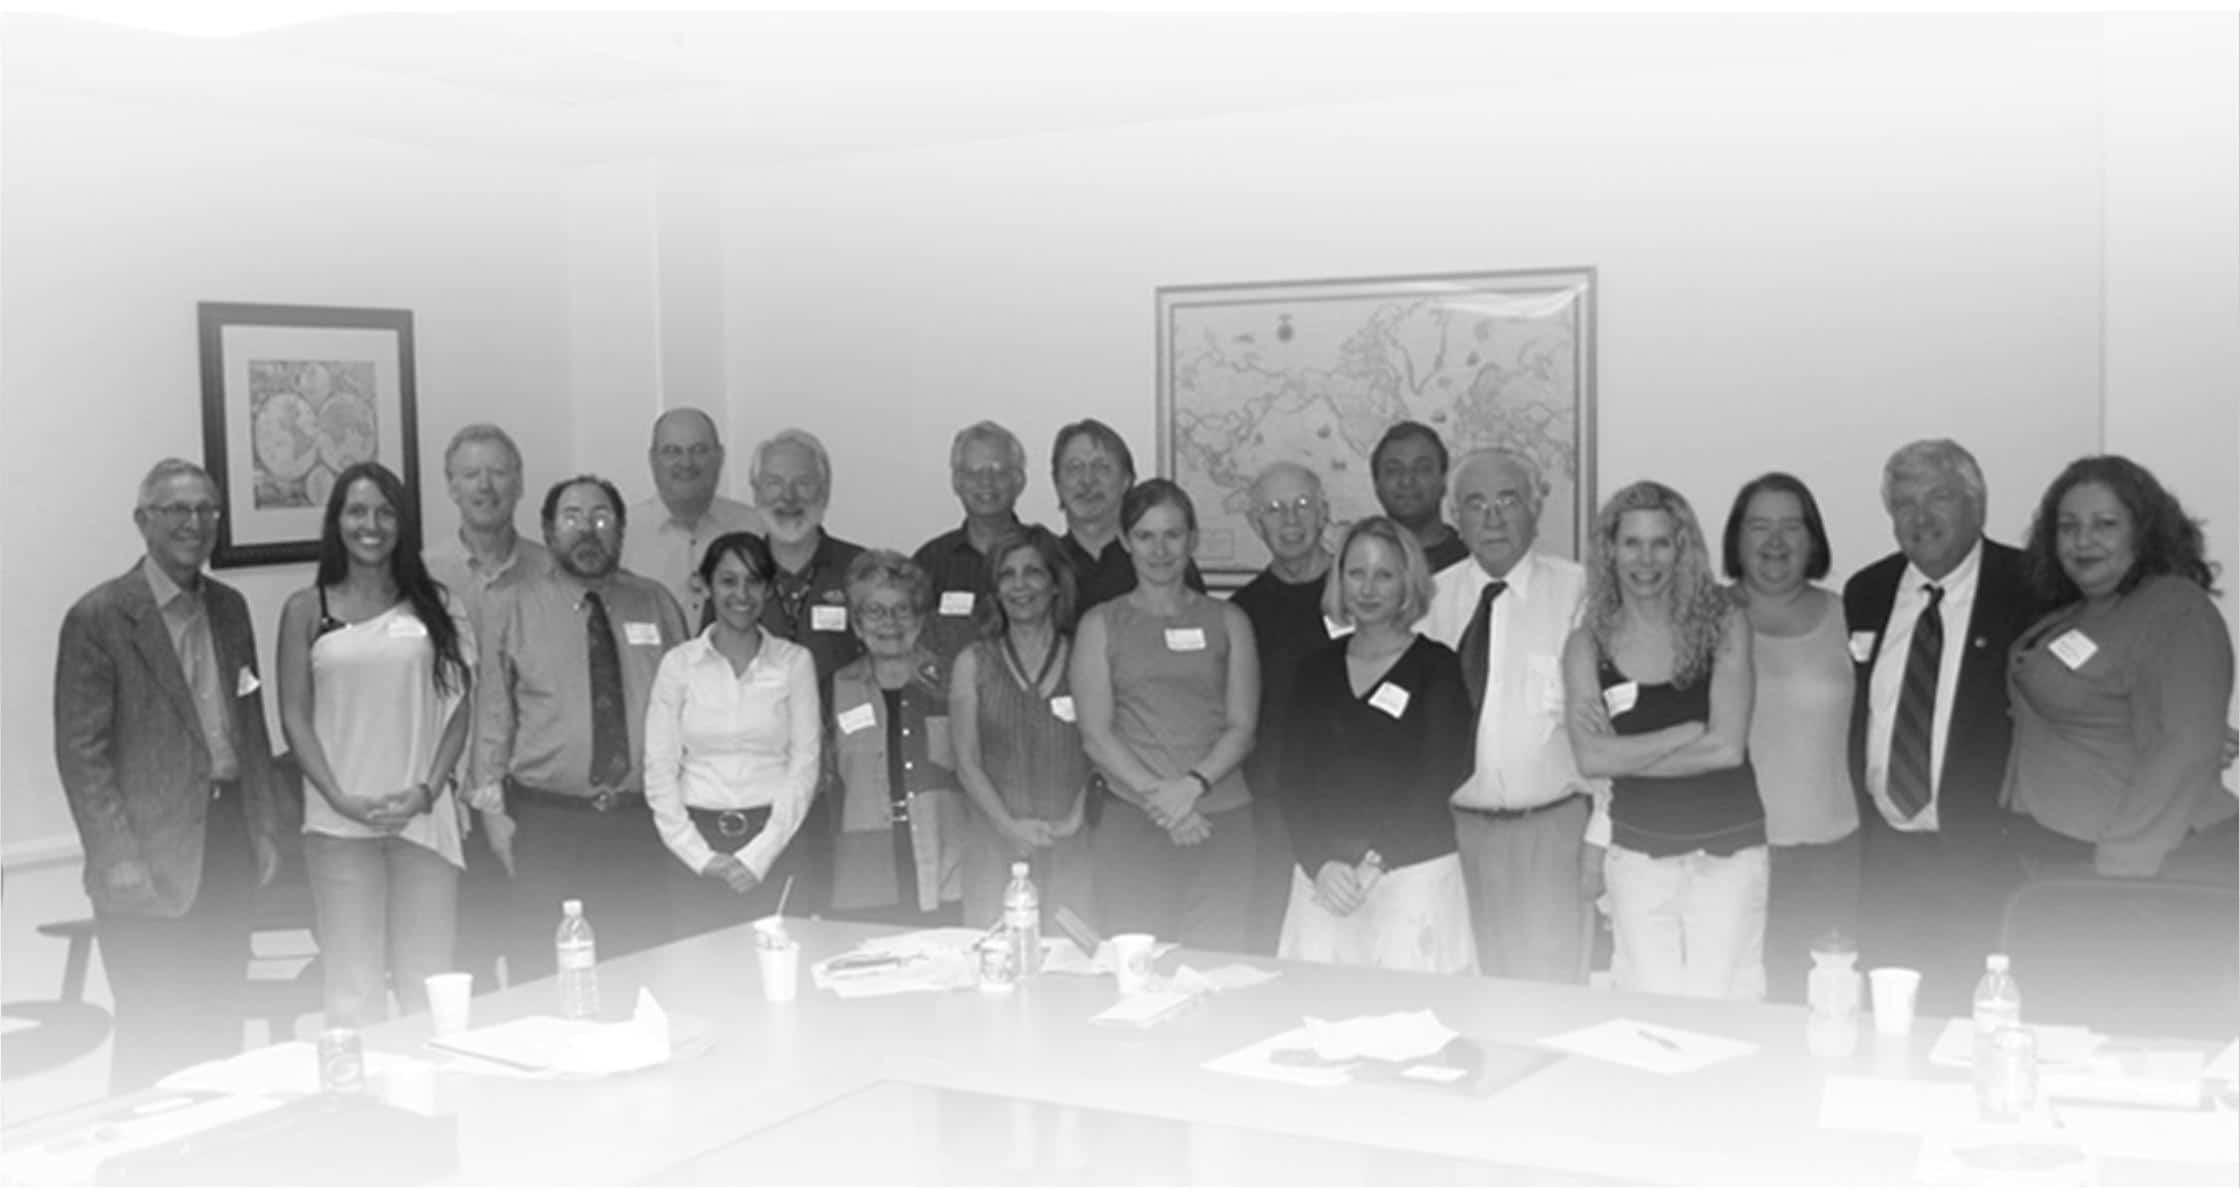 PSR-LA Ambassadors from Sept. 20 session—Front row (left to right) Milford Wyman MD; Natalia Koteva; Ken Levy MFT; Ana Mascareñas (staff); Ruth Tavlin MFT; Farideh Kioumehr-Dadsetan, DVM, DrPH, MPH; Sharon Squassoni (presenter); Tova Fuller; Jose Quiroga MD; Denise Duffield (staff); Margaret Wacker MD; Wayne Glass PhD (presenter);  Martha Dina Argüello (staff) Back row (left to right) Bob Dodge MD; Michael Gutstadt PsyD; Stephen Coles MD, PhD; Bennet Ramberg PhD, JD (presenter); Curren Warf MD;  Bill Perkins MD; Anshu Vashishtha MD, PhD, MACP, RAC; Dorcas Tokes (not pictured); Shirah Vollmer MD (not pictured)